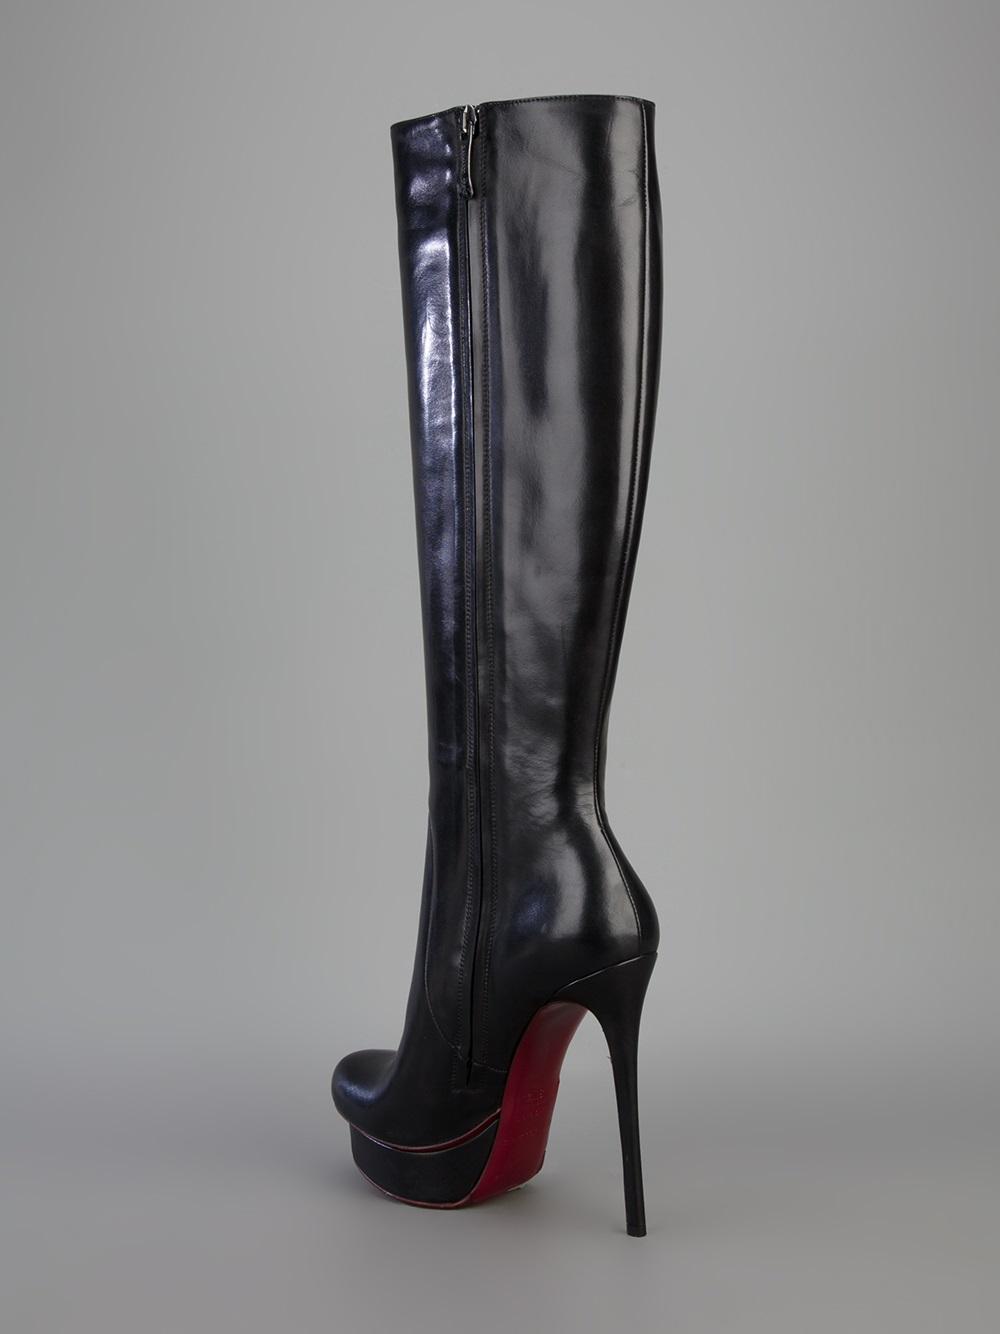 lyst gianmarco lorenzi knee high platform boot in black rh lyst com